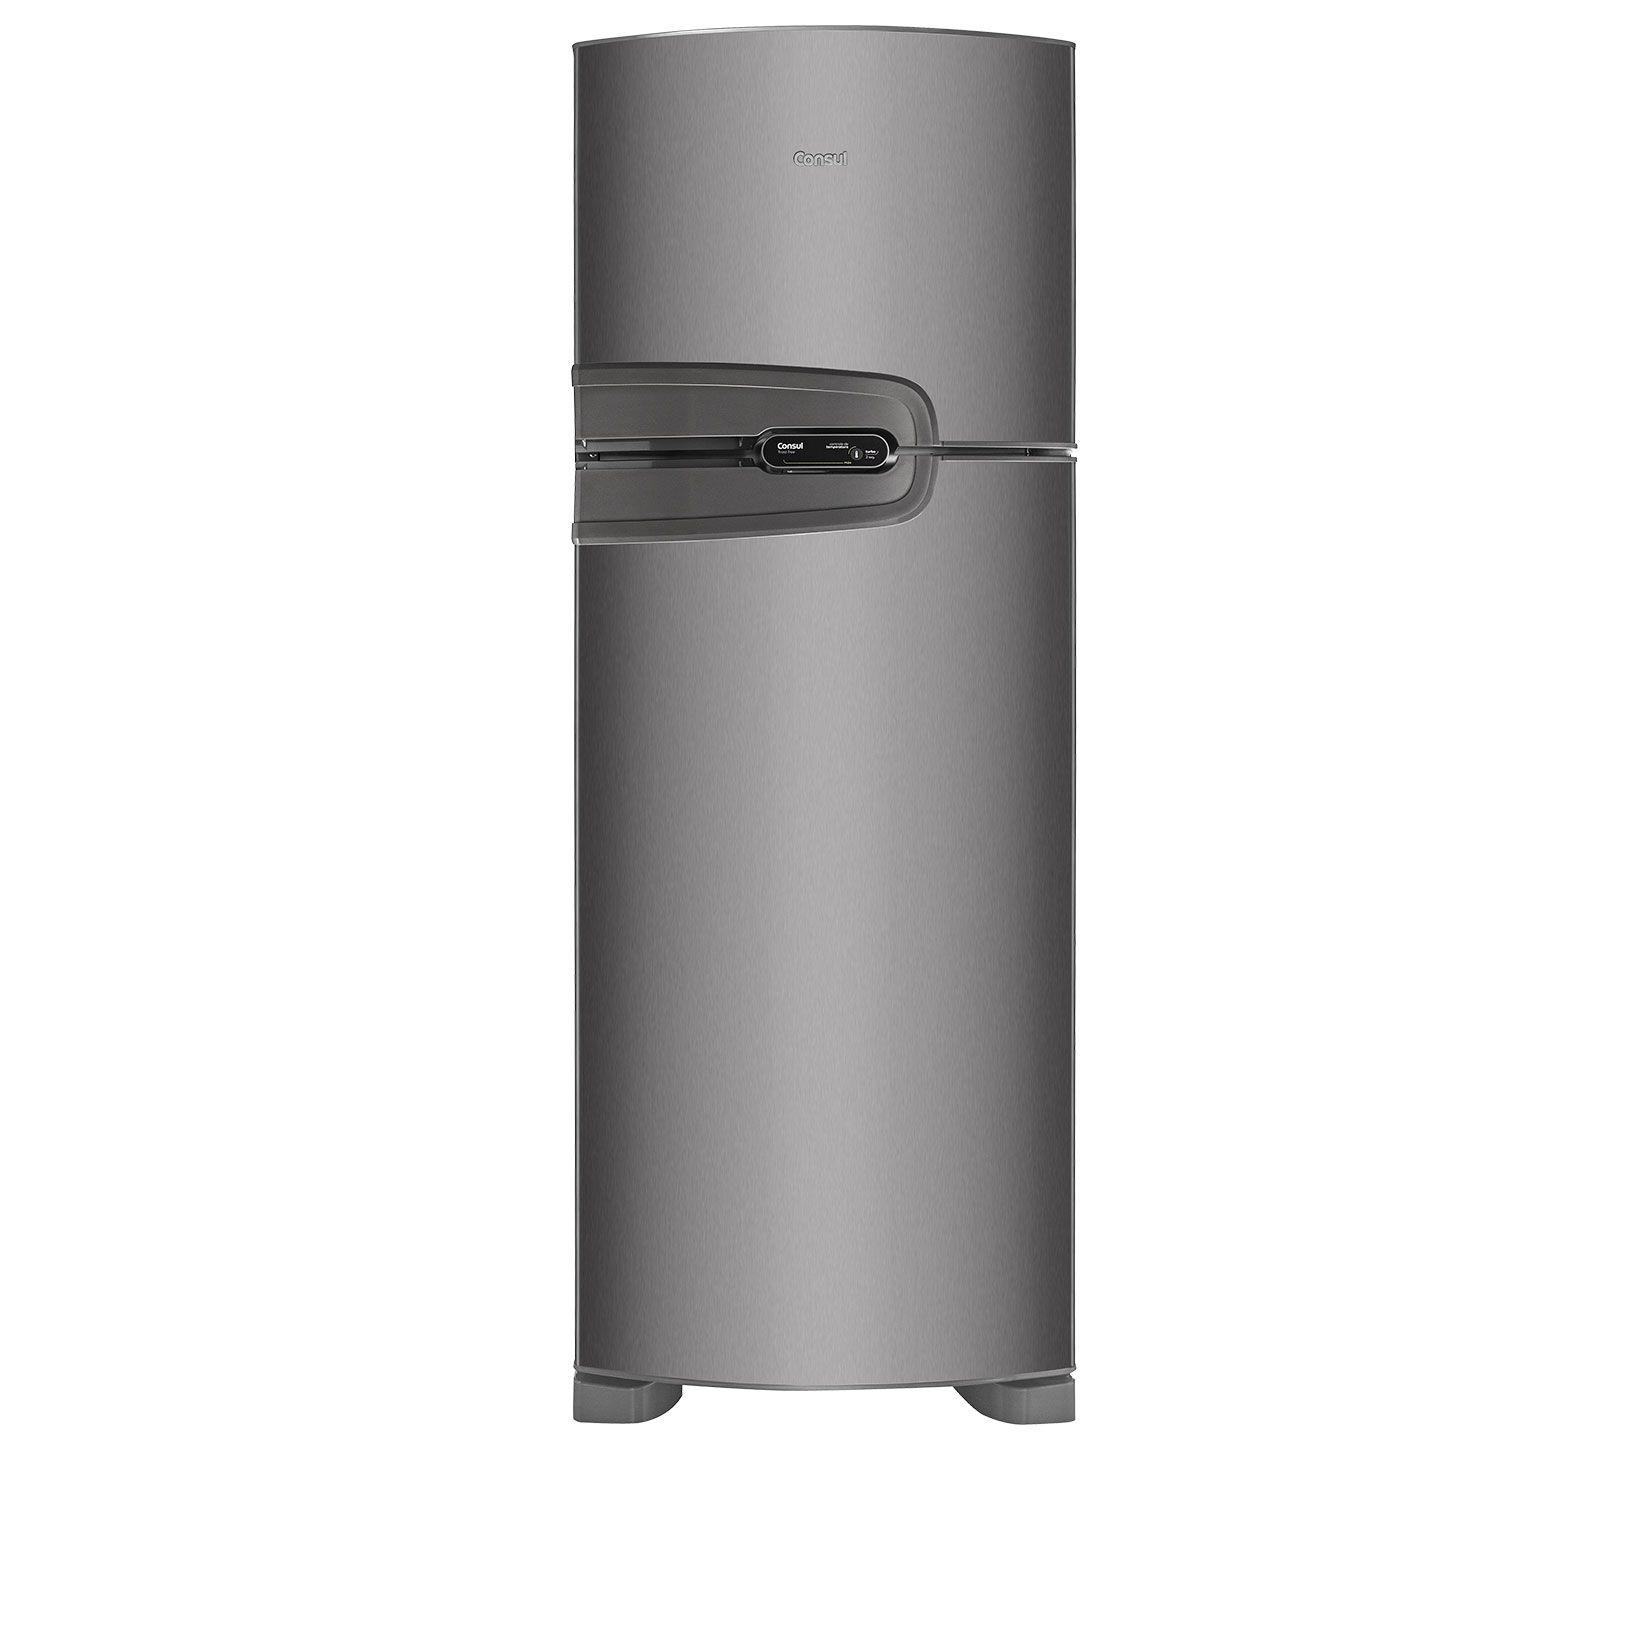 70fe2985f Geladeira Consul Frost Free Duplex 340 litros cor Inox